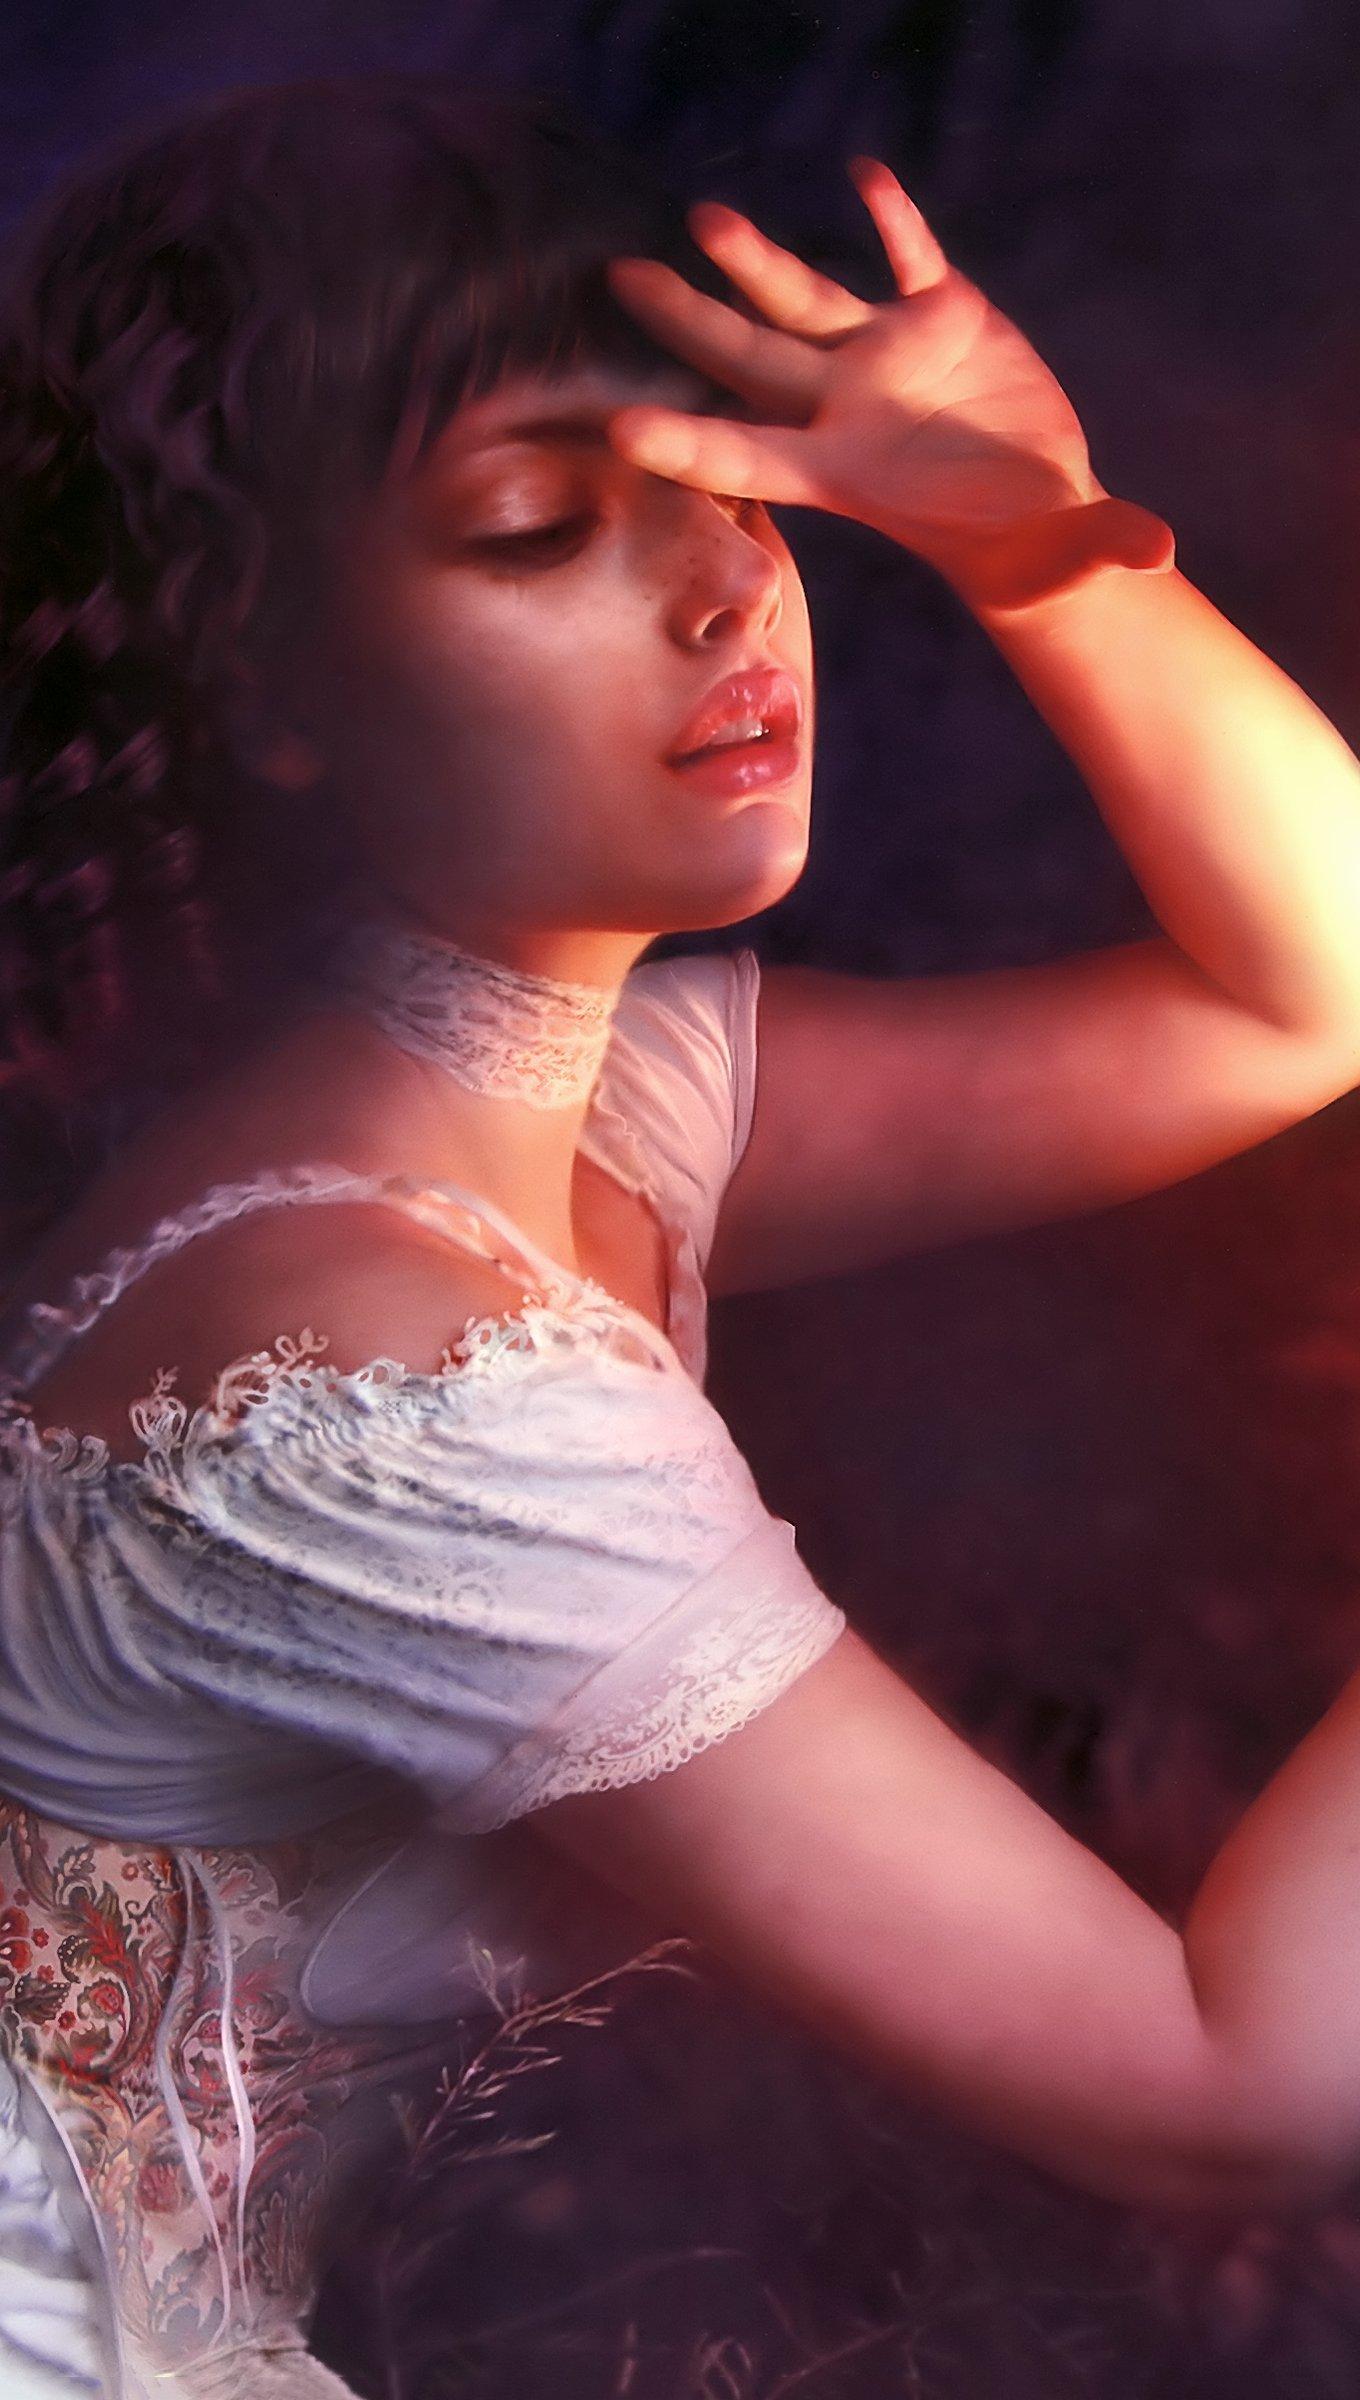 Wallpaper Woman with phoenix Illustration Vertical